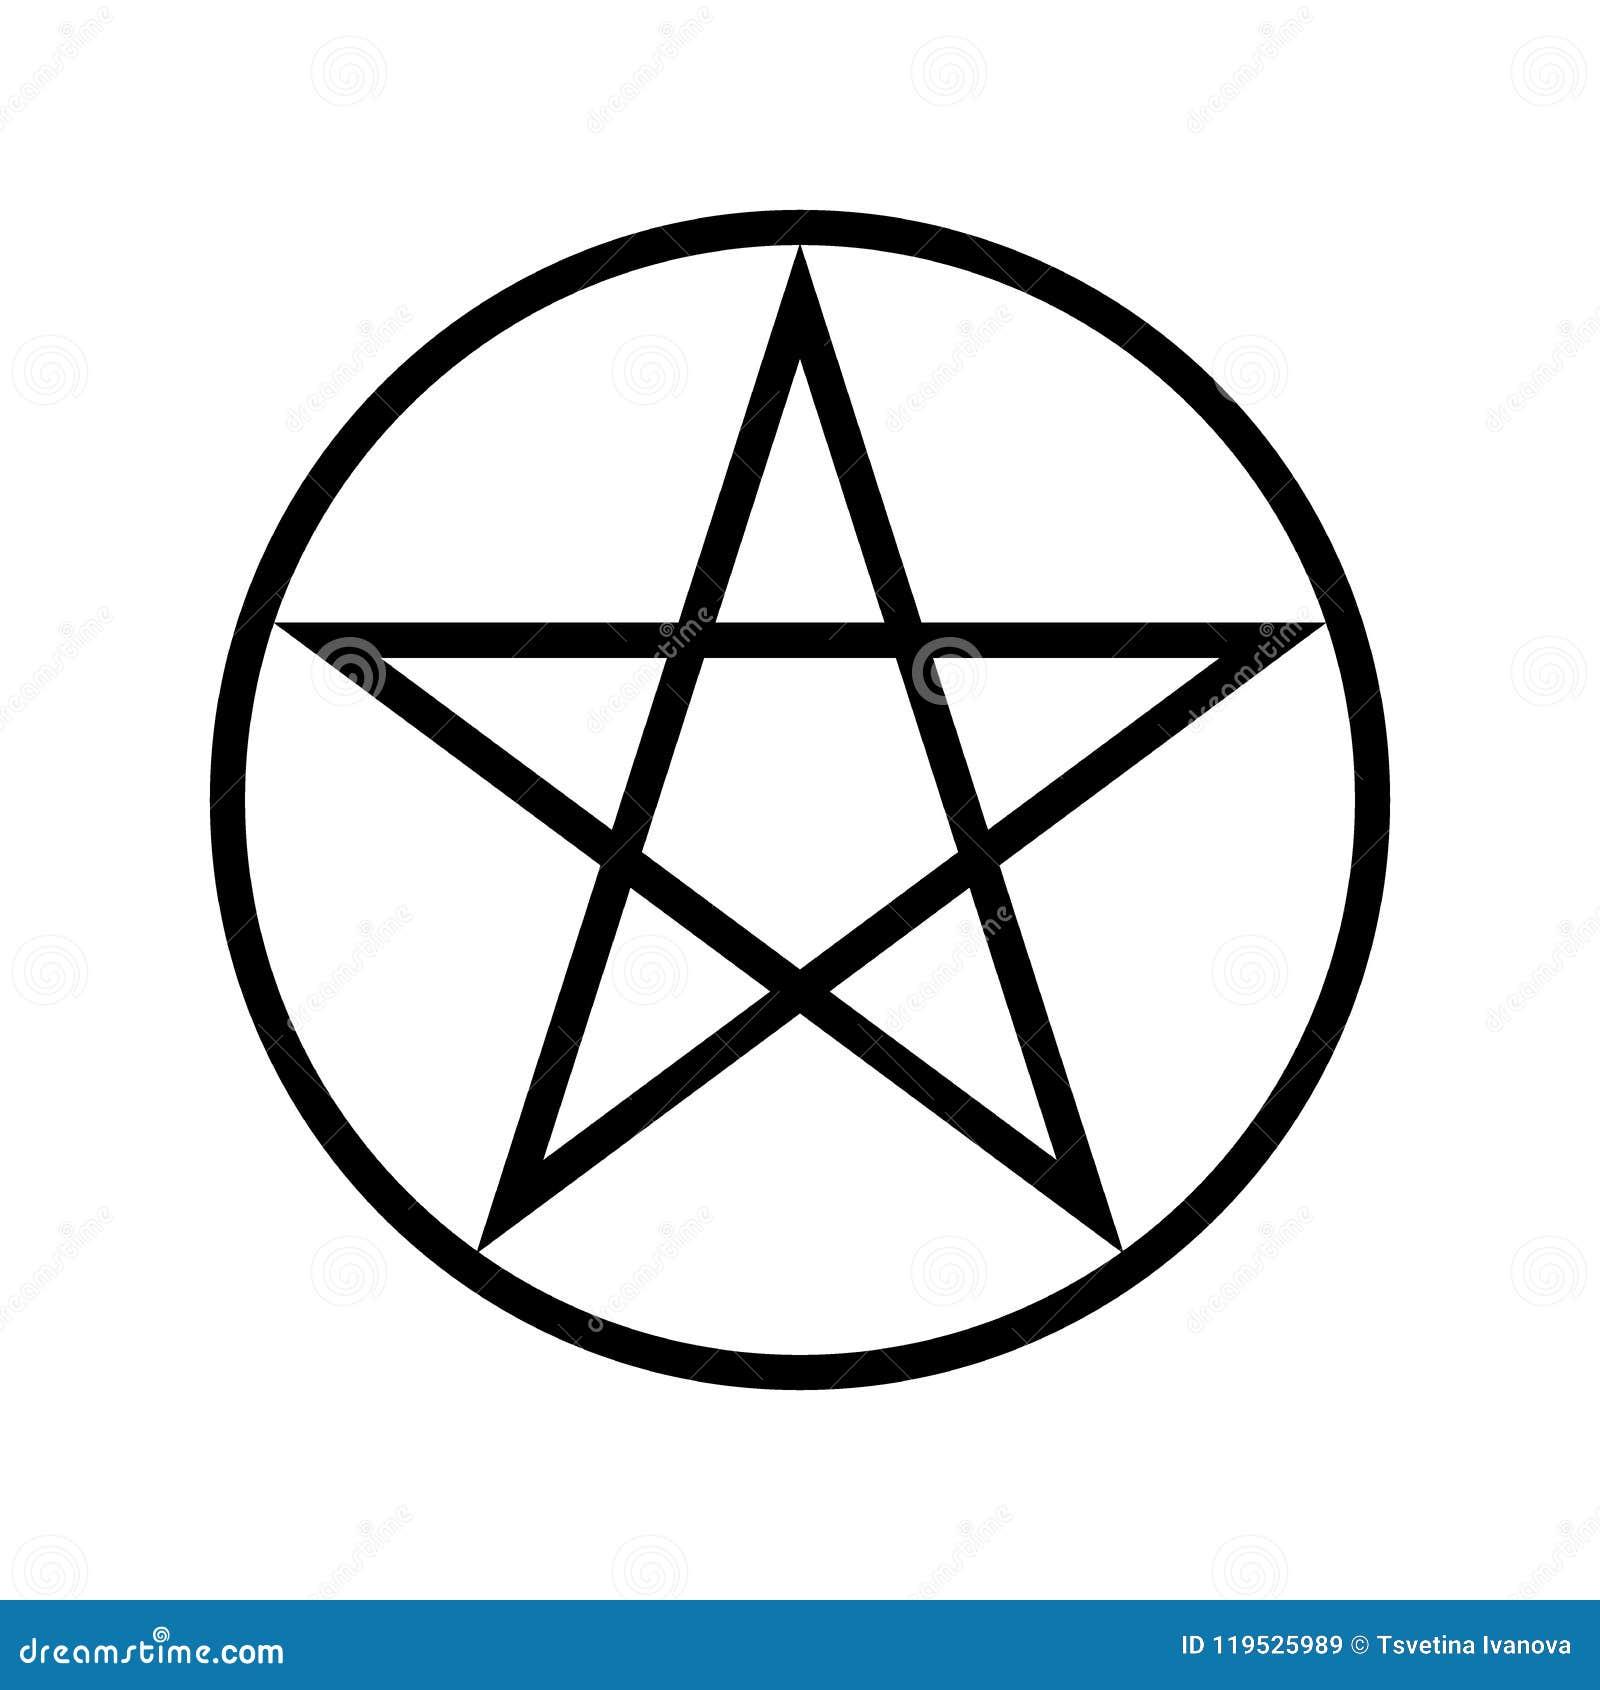 Wicca Pentagram Religious Symbol Simple Icon Stock Vector